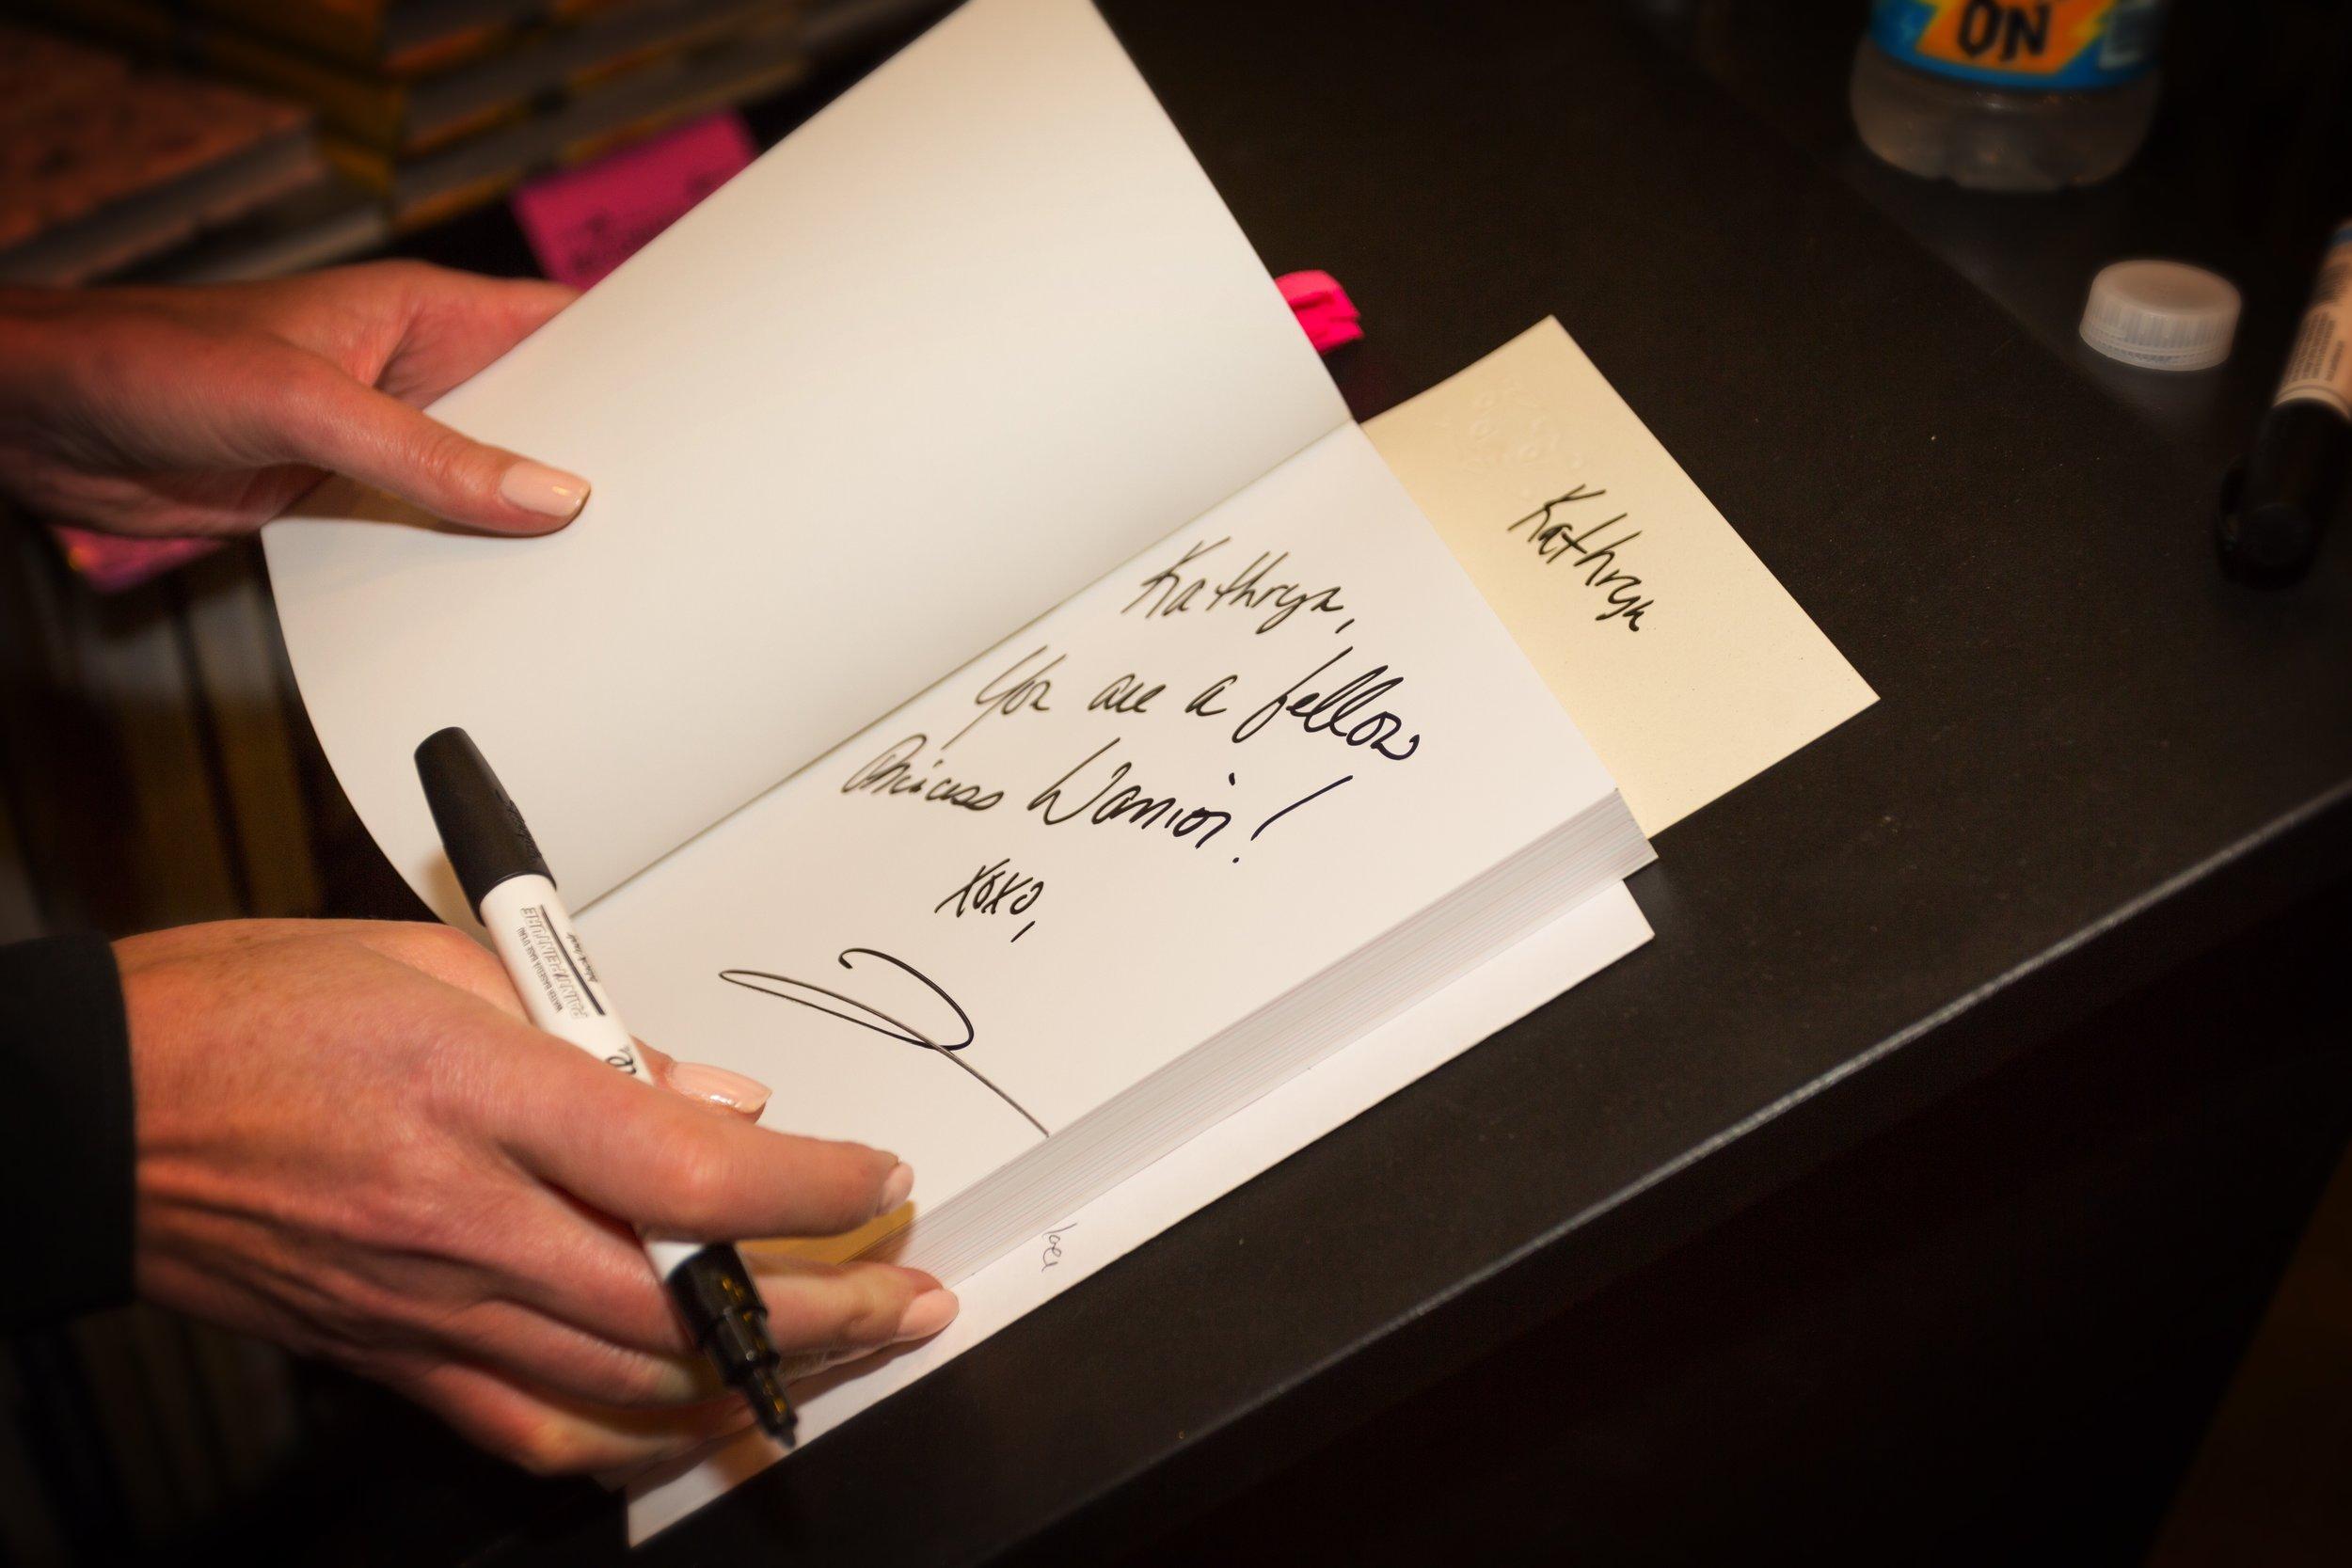 #TamiHolzman Tami Holzman #Keynotespeaker, Keynote Speaker, #emotionalintellegence Emotional Intelligence, #eq #csuite C-Suite #sales Sales #Author #Writer #Speaker, Author, female empowerment, #Business Business #Press Press#booksoup